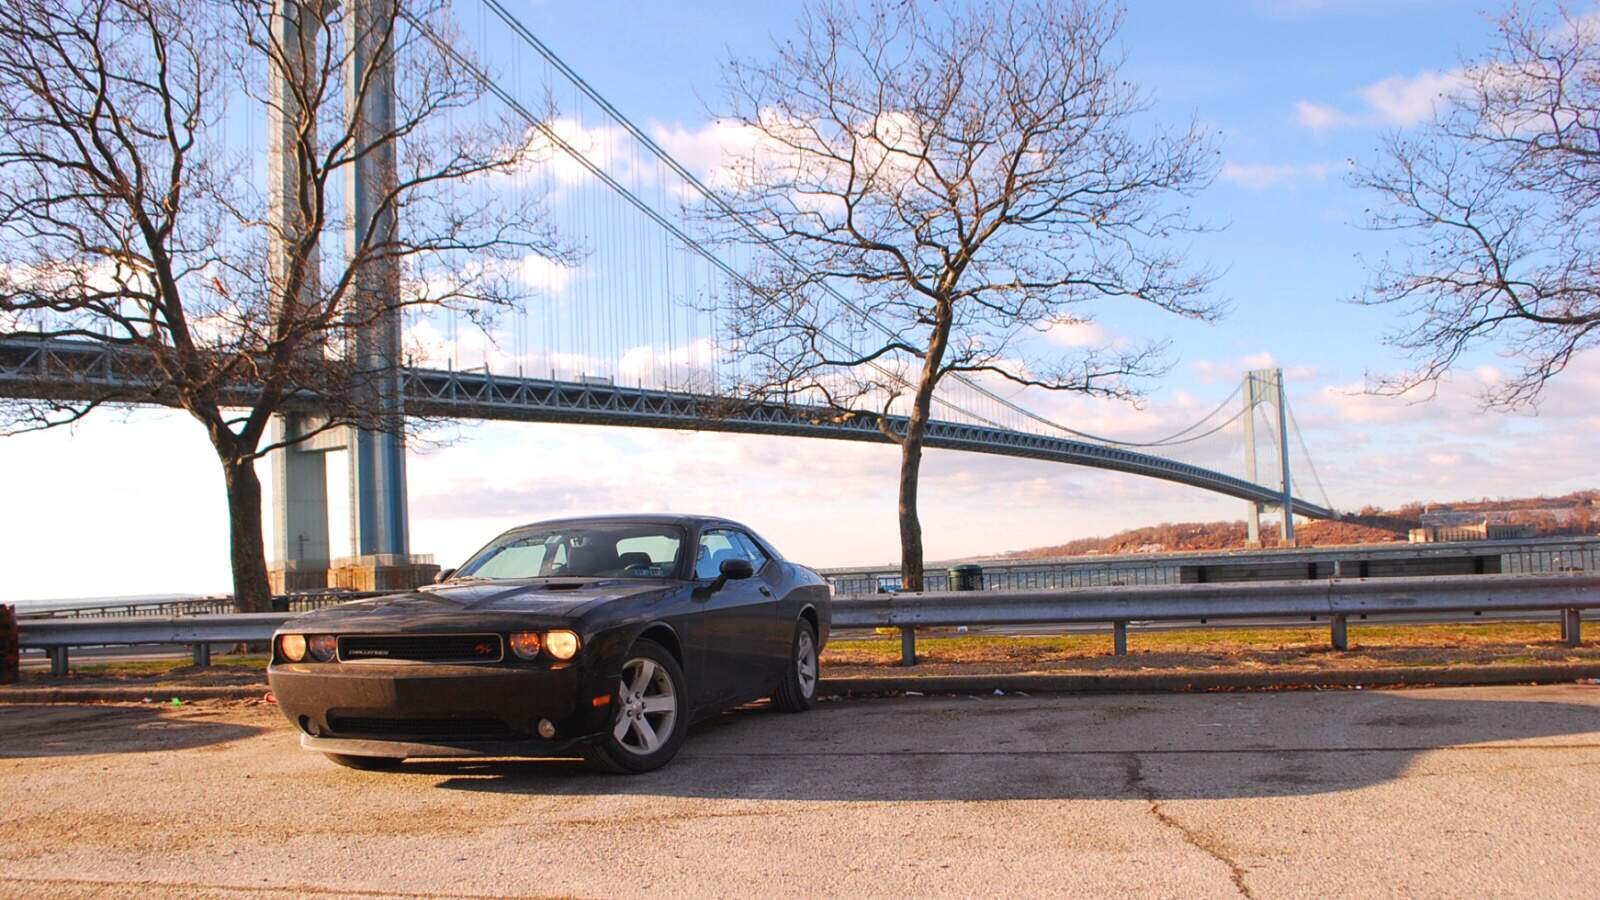 Dodge challenger pred jednim z New Yorksých mostů